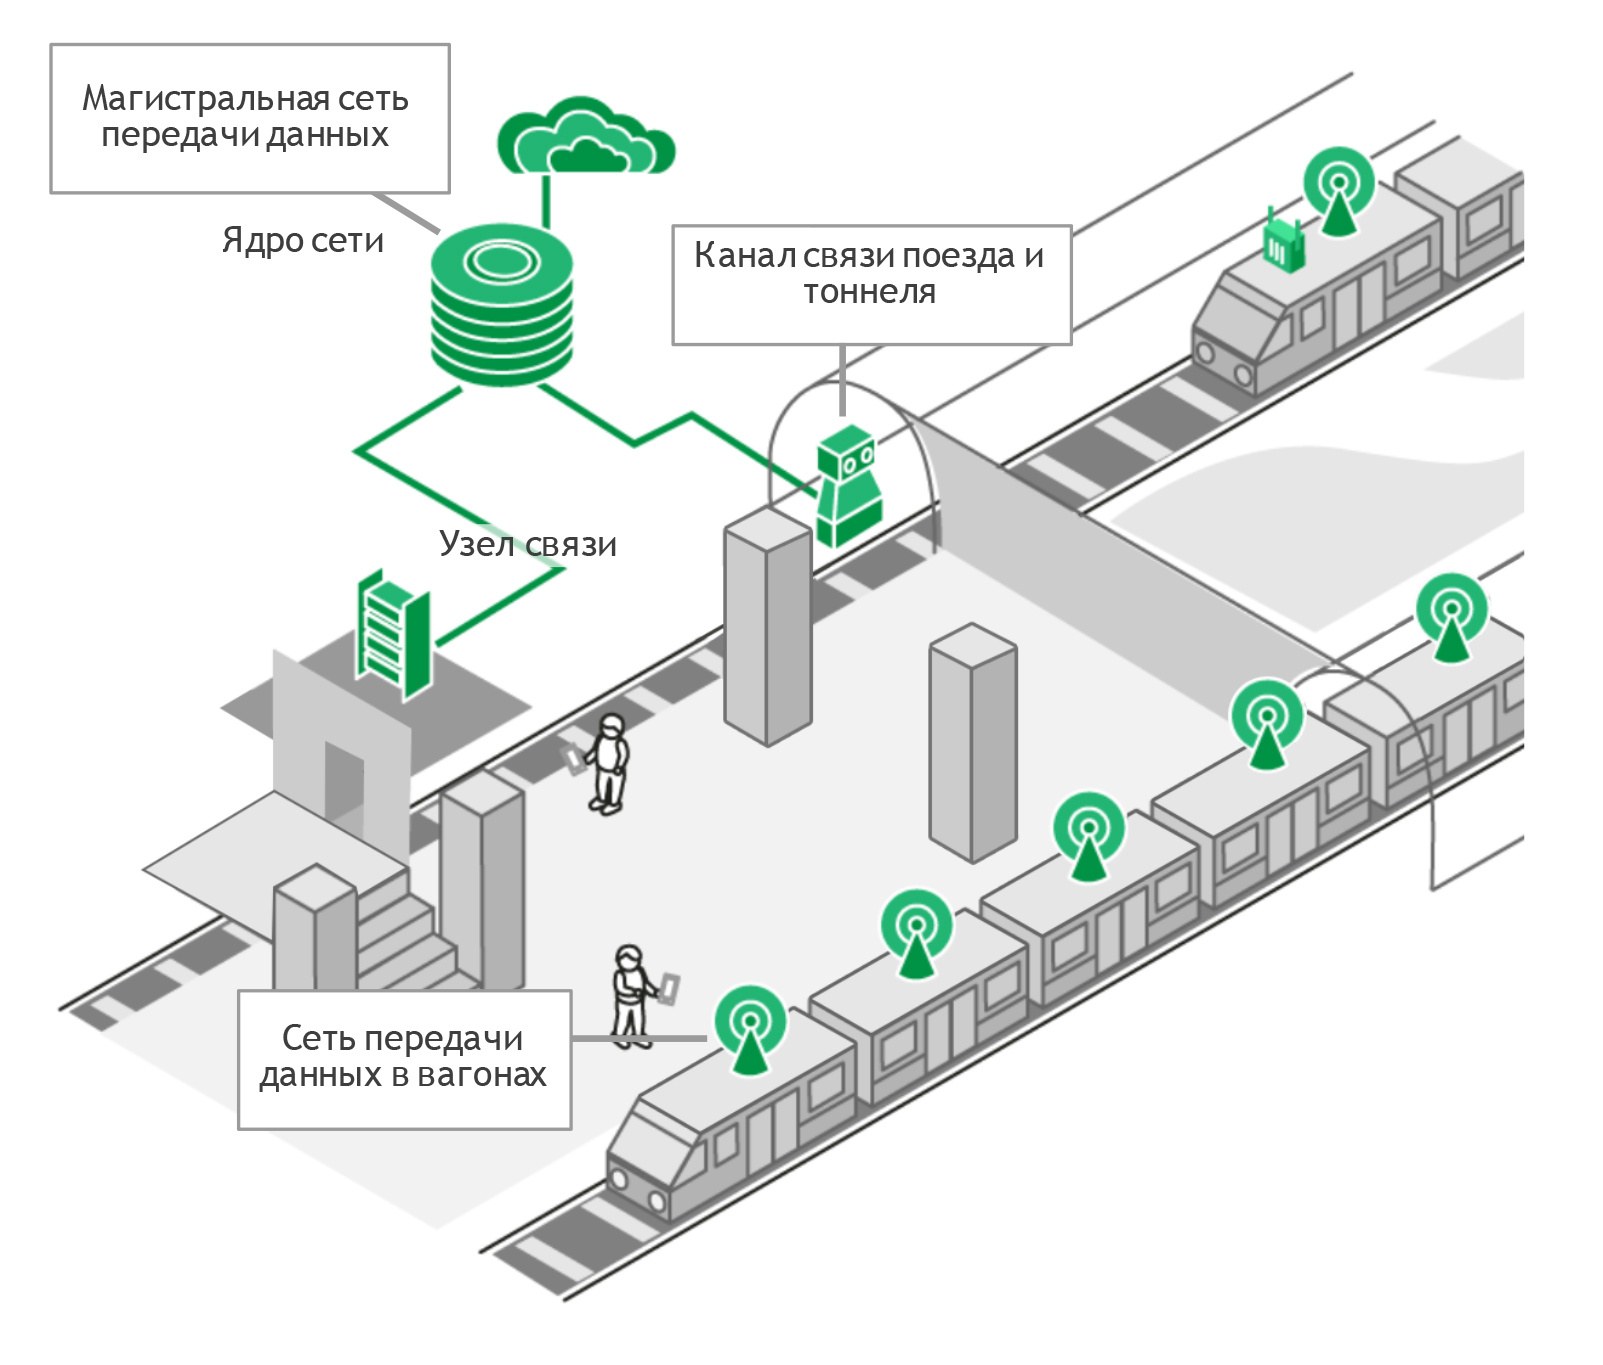 Wi-Fi в метро: архитектура сети и подземные камни - 2